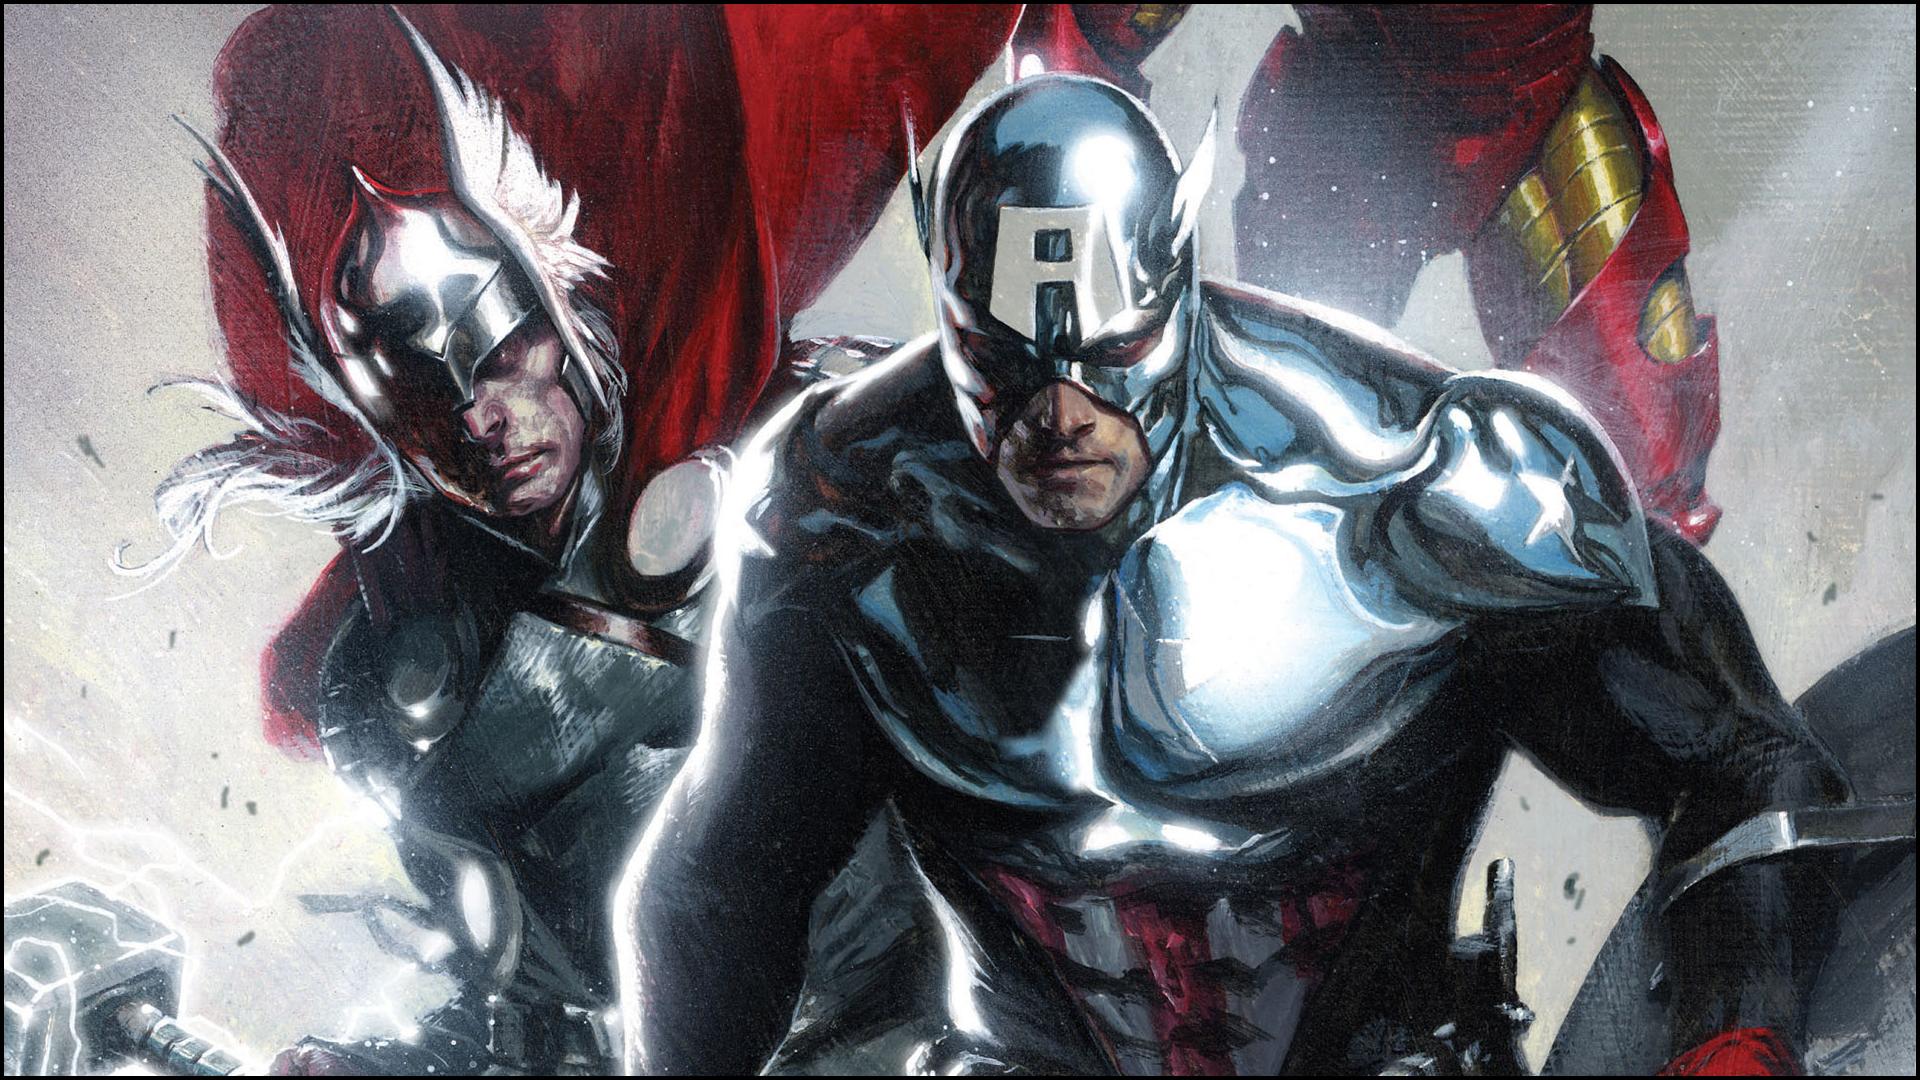 Papel De Parede Do Capitao America: Thor And Iron Man Papel De Parede HD